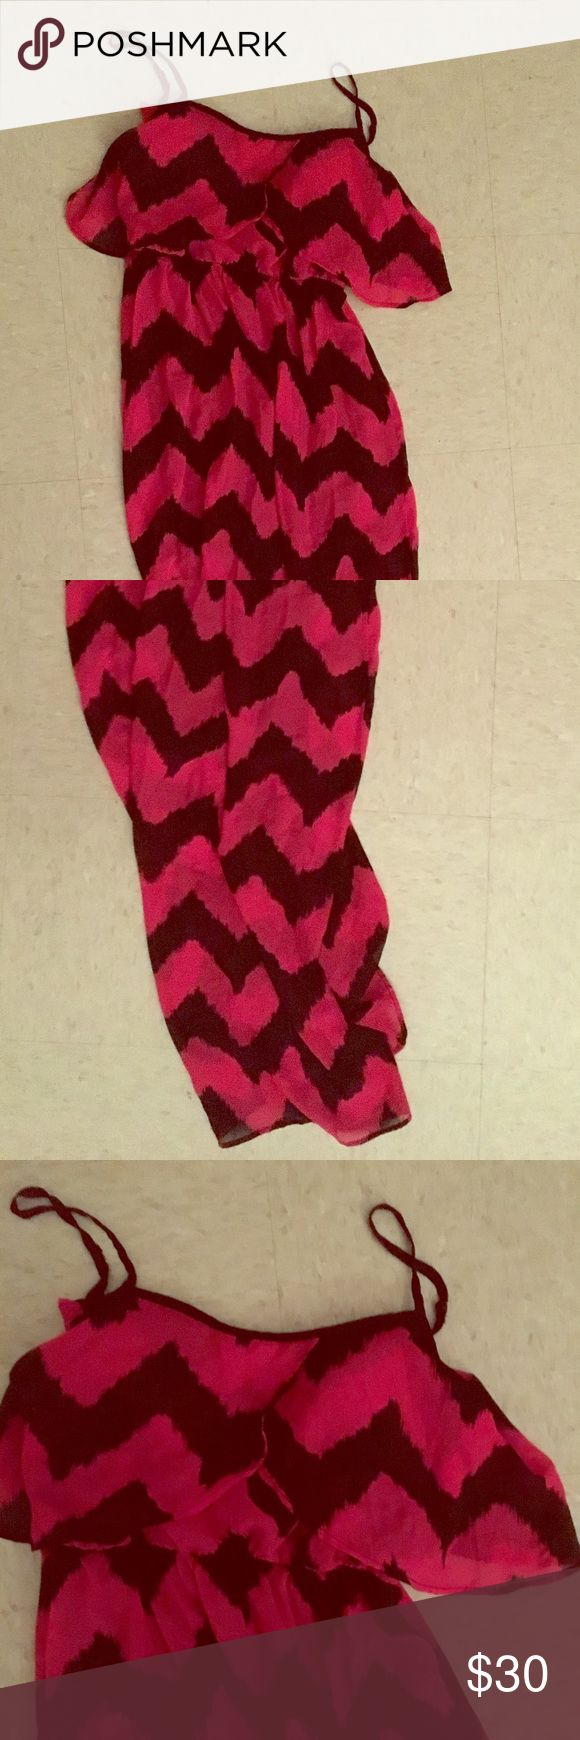 Pink and Black Chevron Summer Tank Maxi Dress Pink and Black Chevron Summer Tank Maxi Dress - Make me an offer! Dresses Maxi